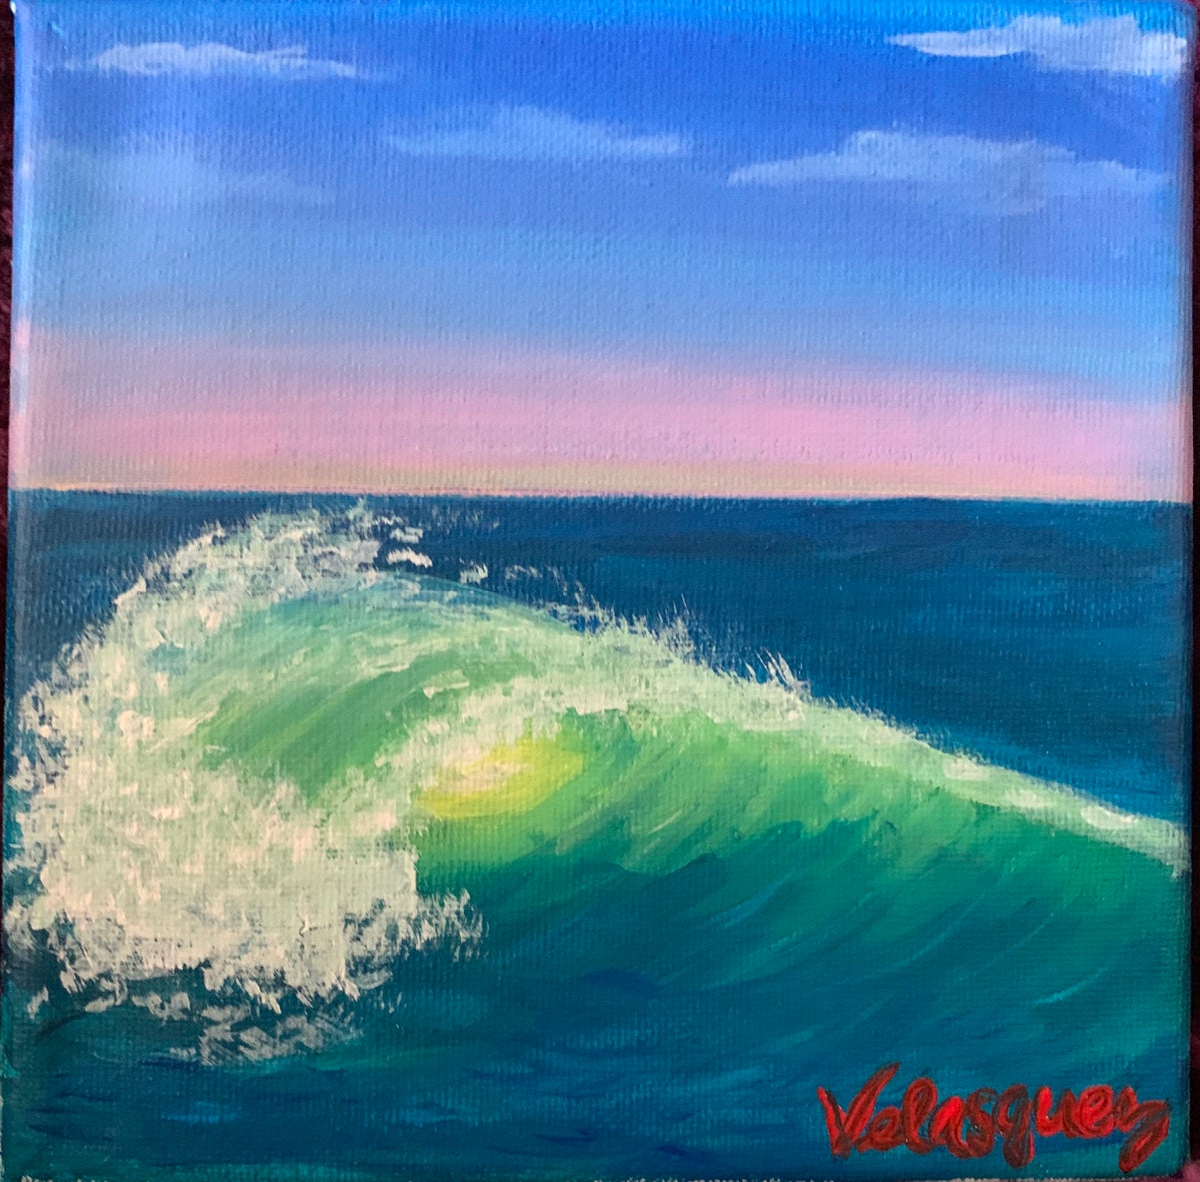 Image of Little ocean wave